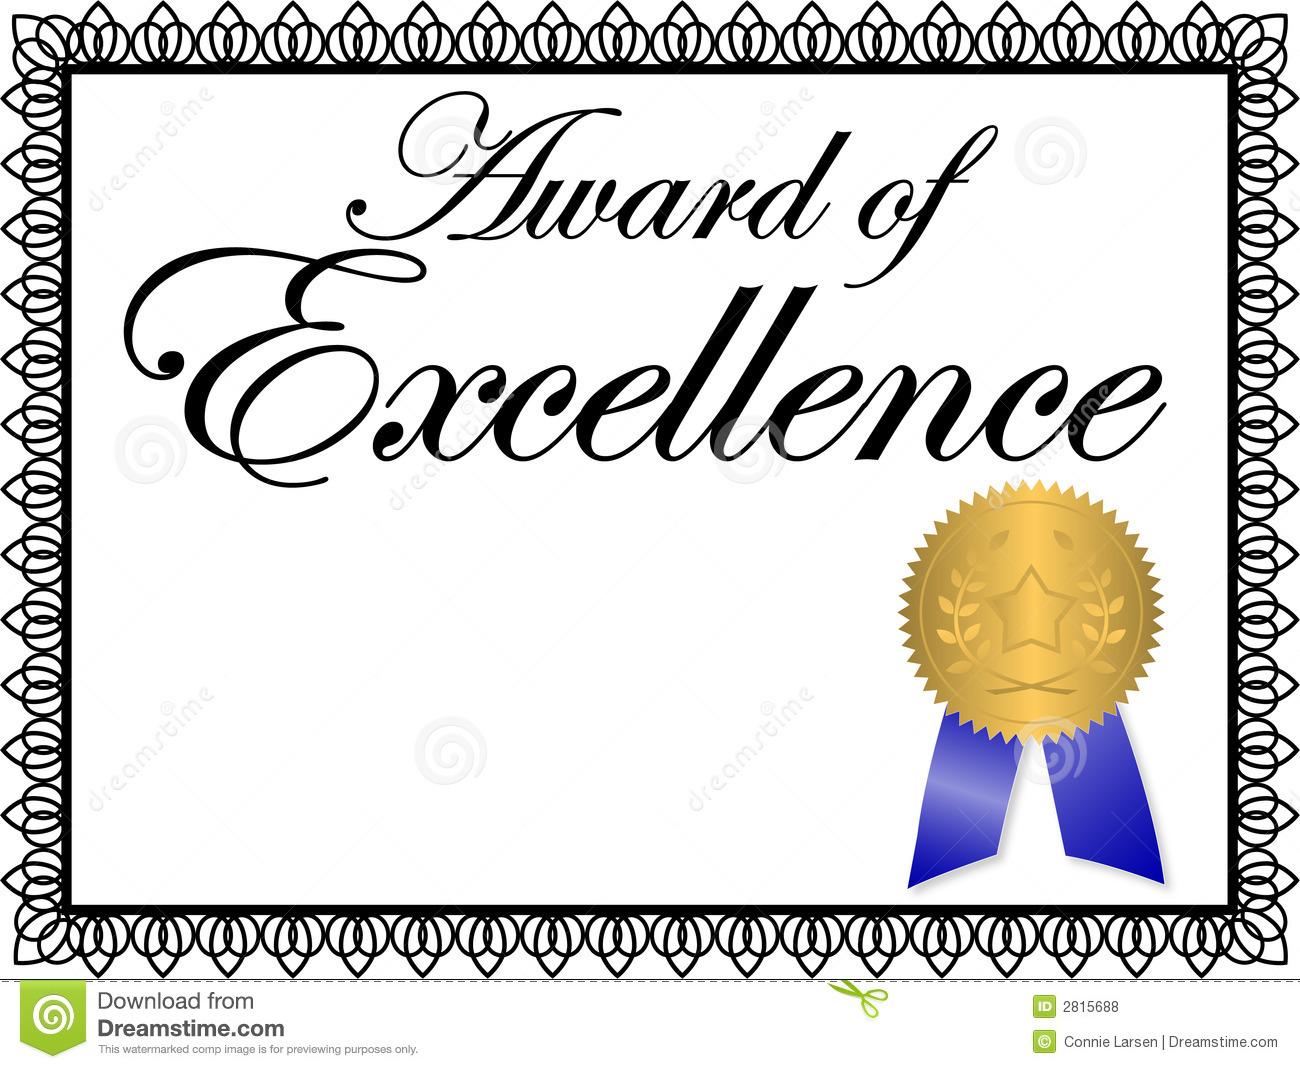 Award Certificate Clipart.